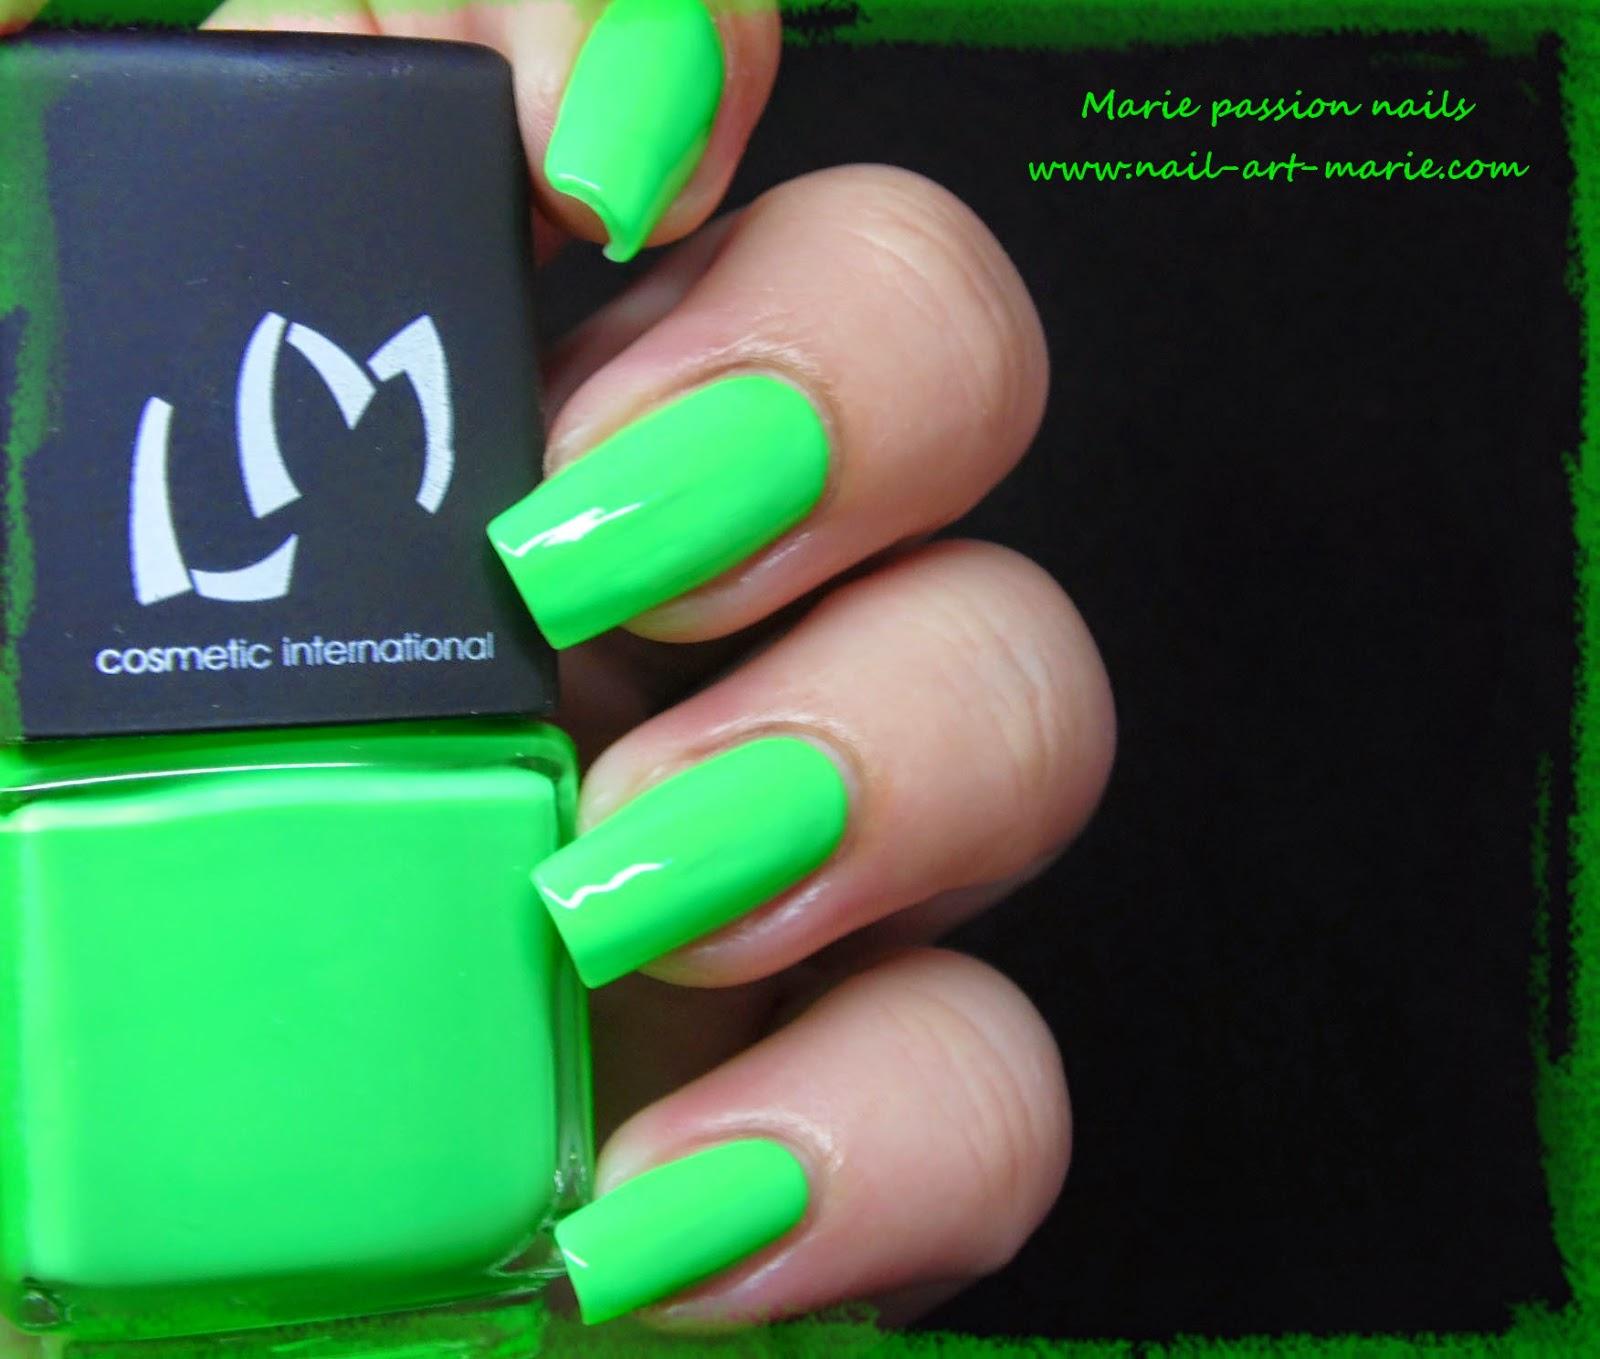 LM Cosmetic Duchamp3